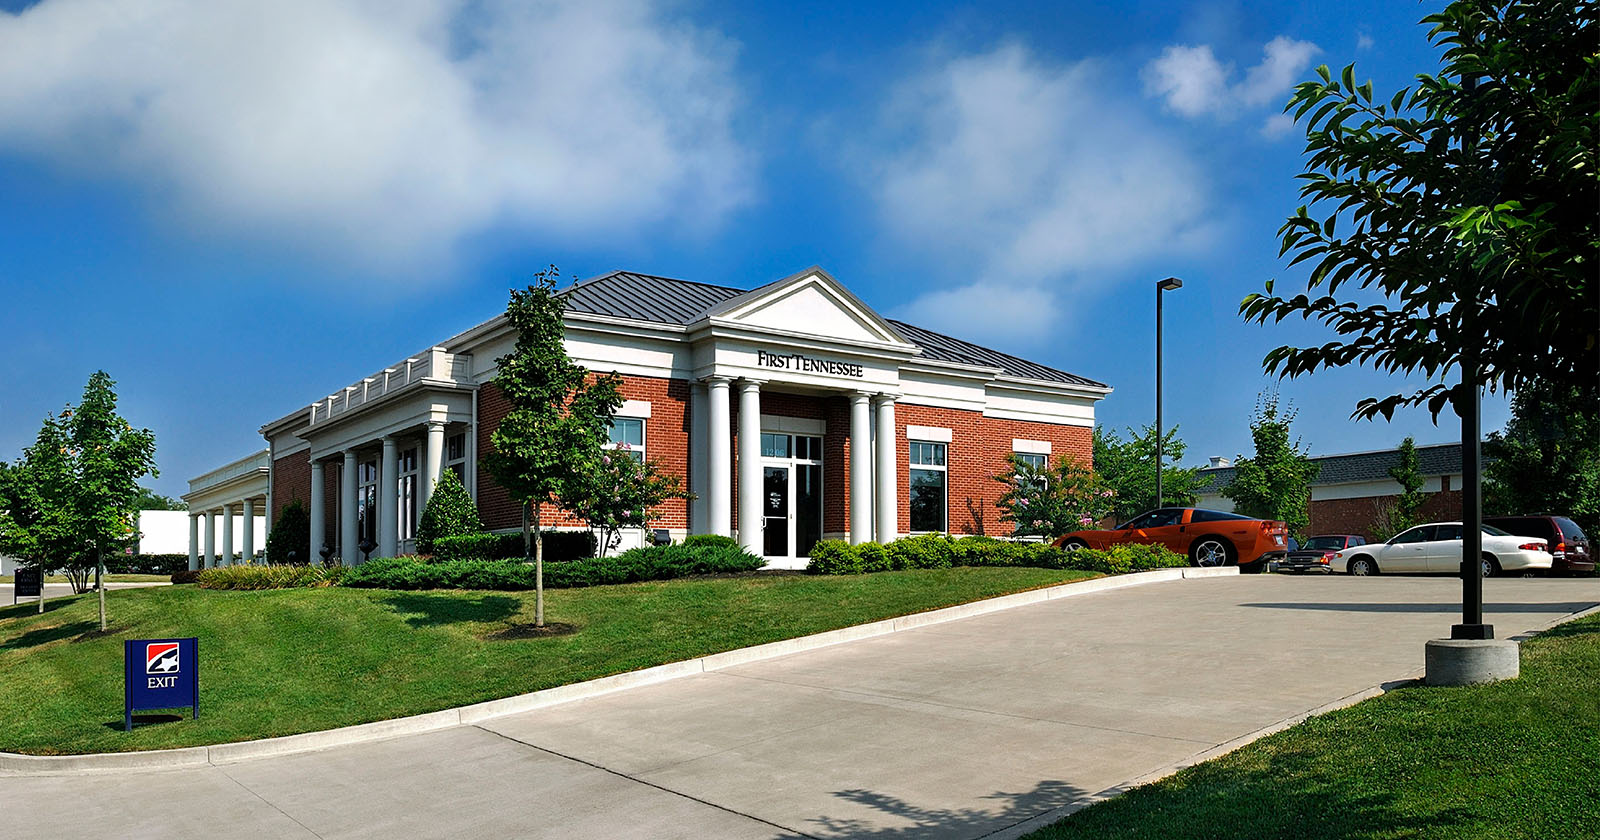 First Tennessee Bank - Gallatin, Gallatin, TN